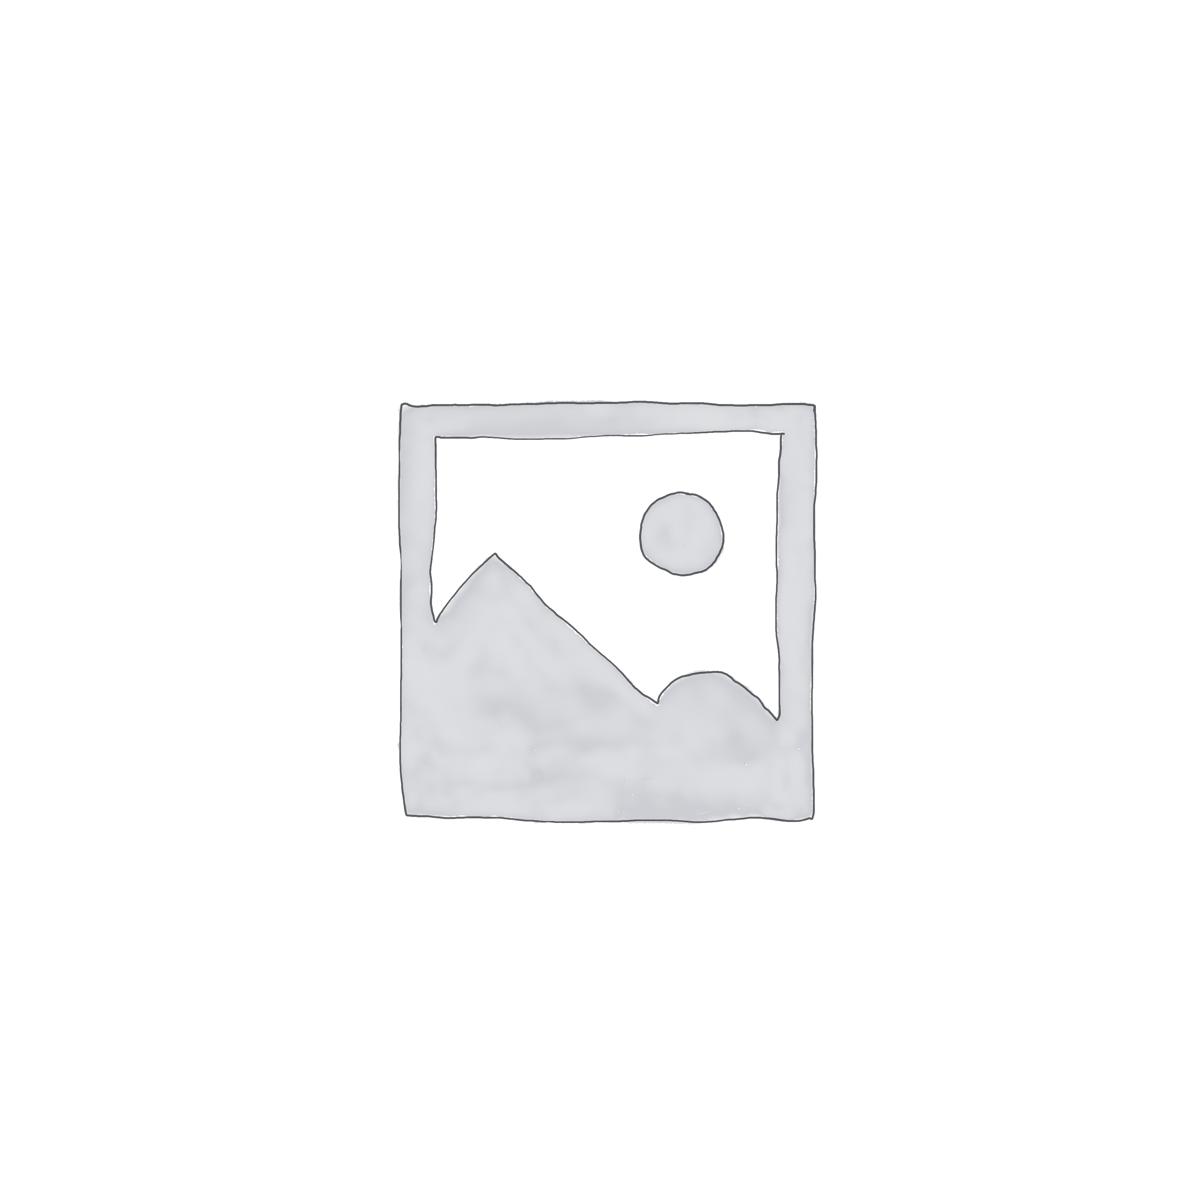 Sea Whales Sharkes Wallpaper Mural